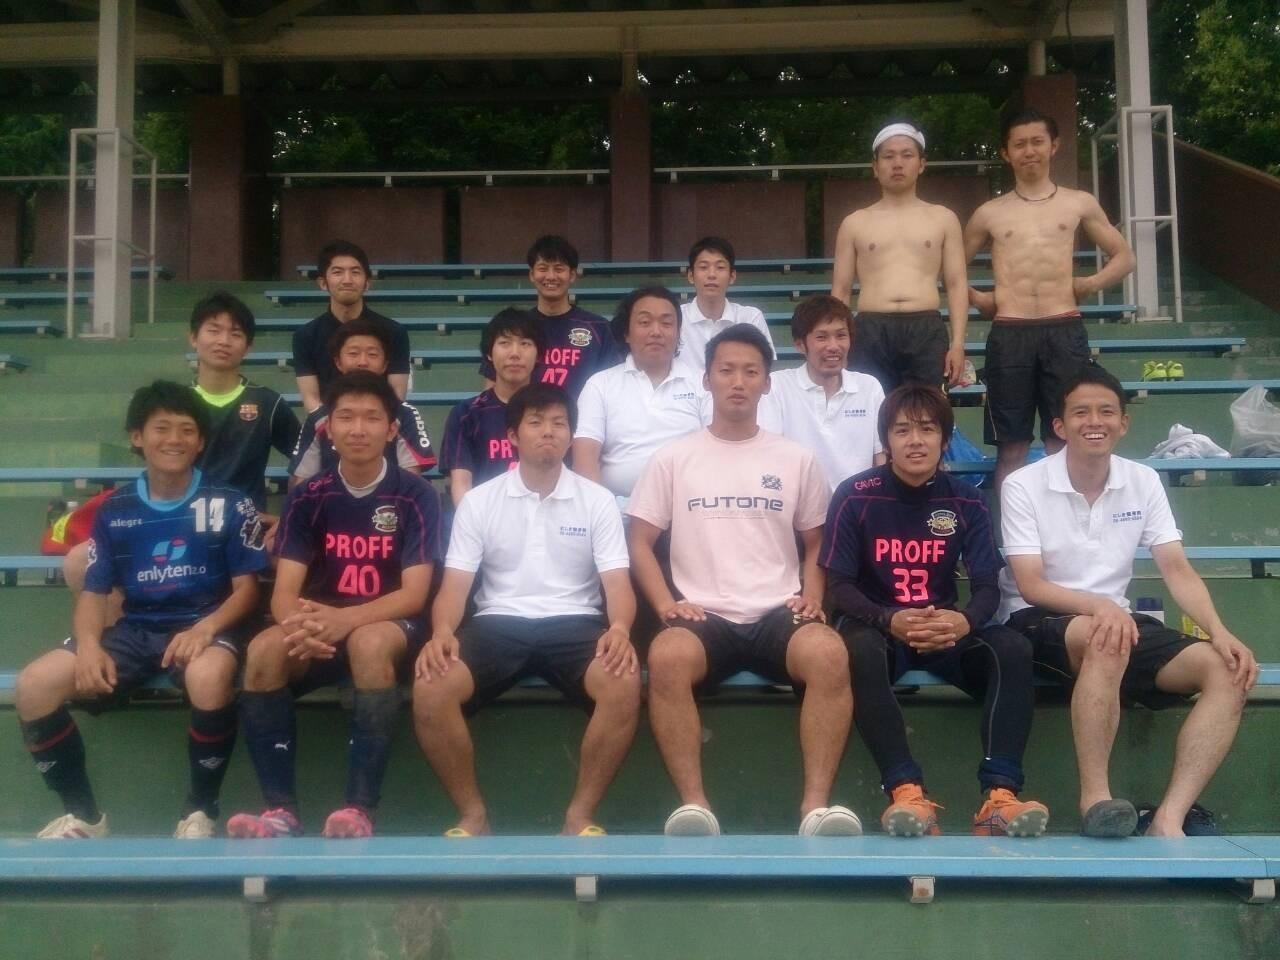 2015/6/14 久宝寺緑地陸上競技場 vs FORE:ZA